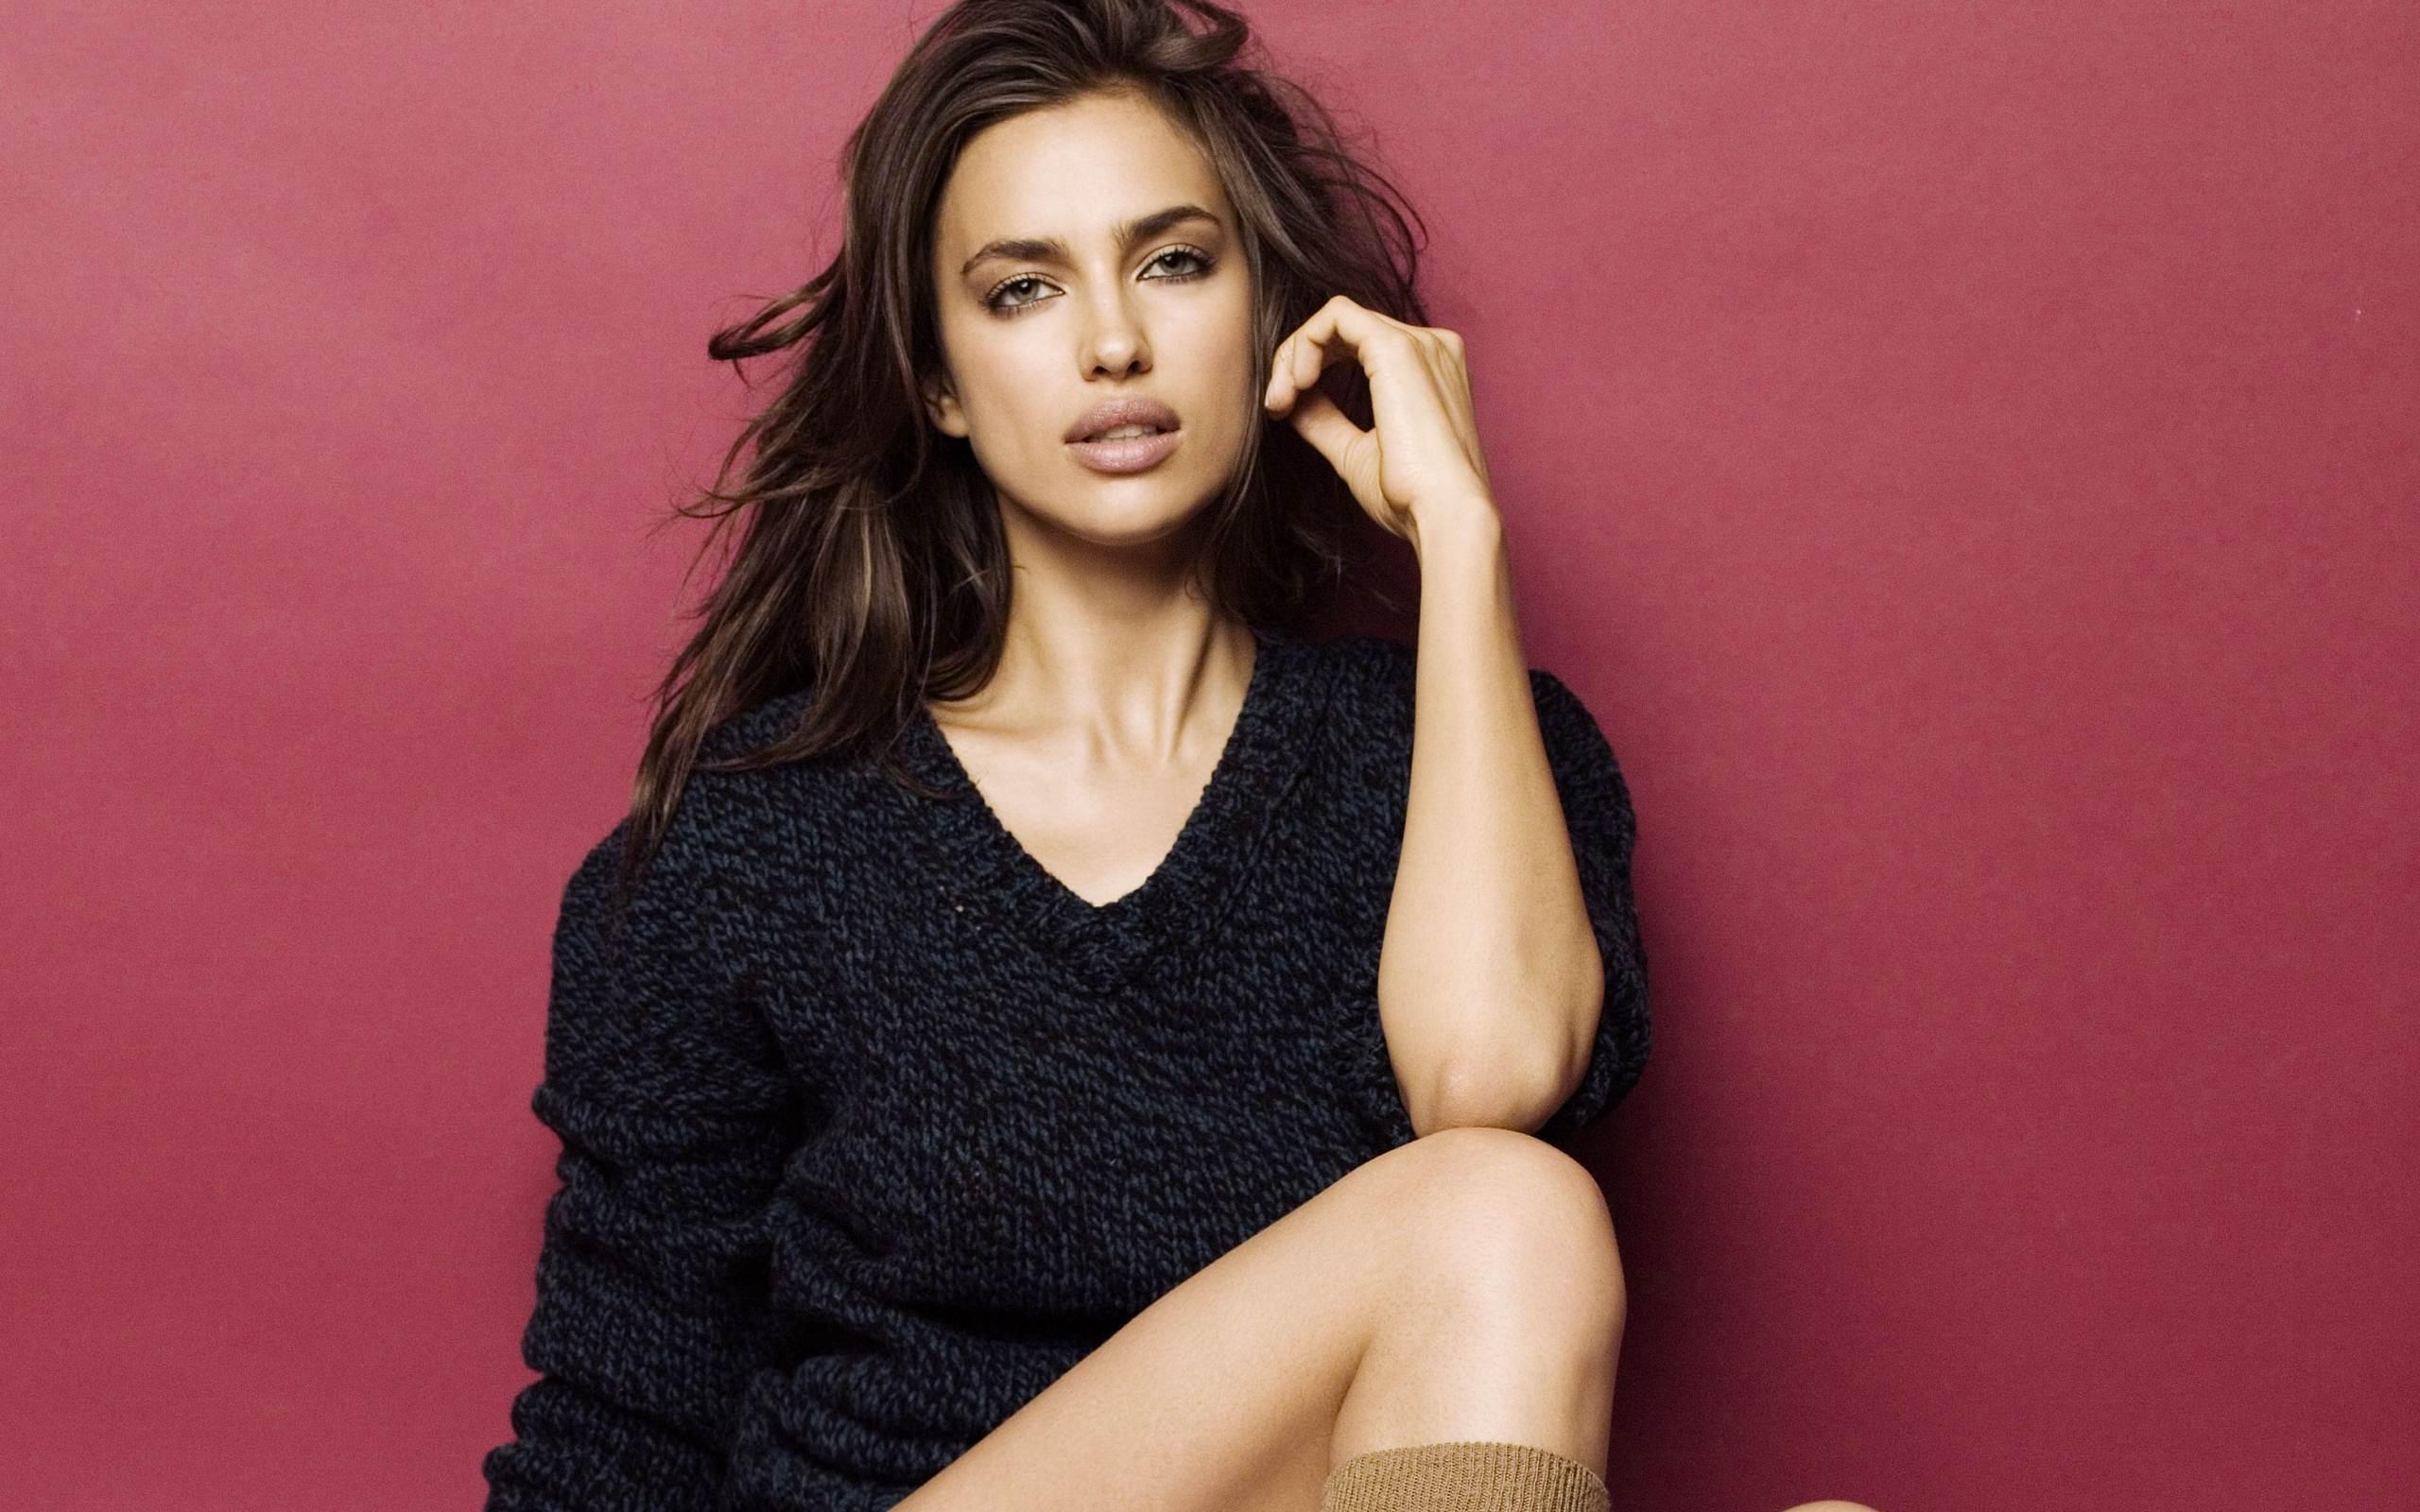 Irina Shayk Backgrounds